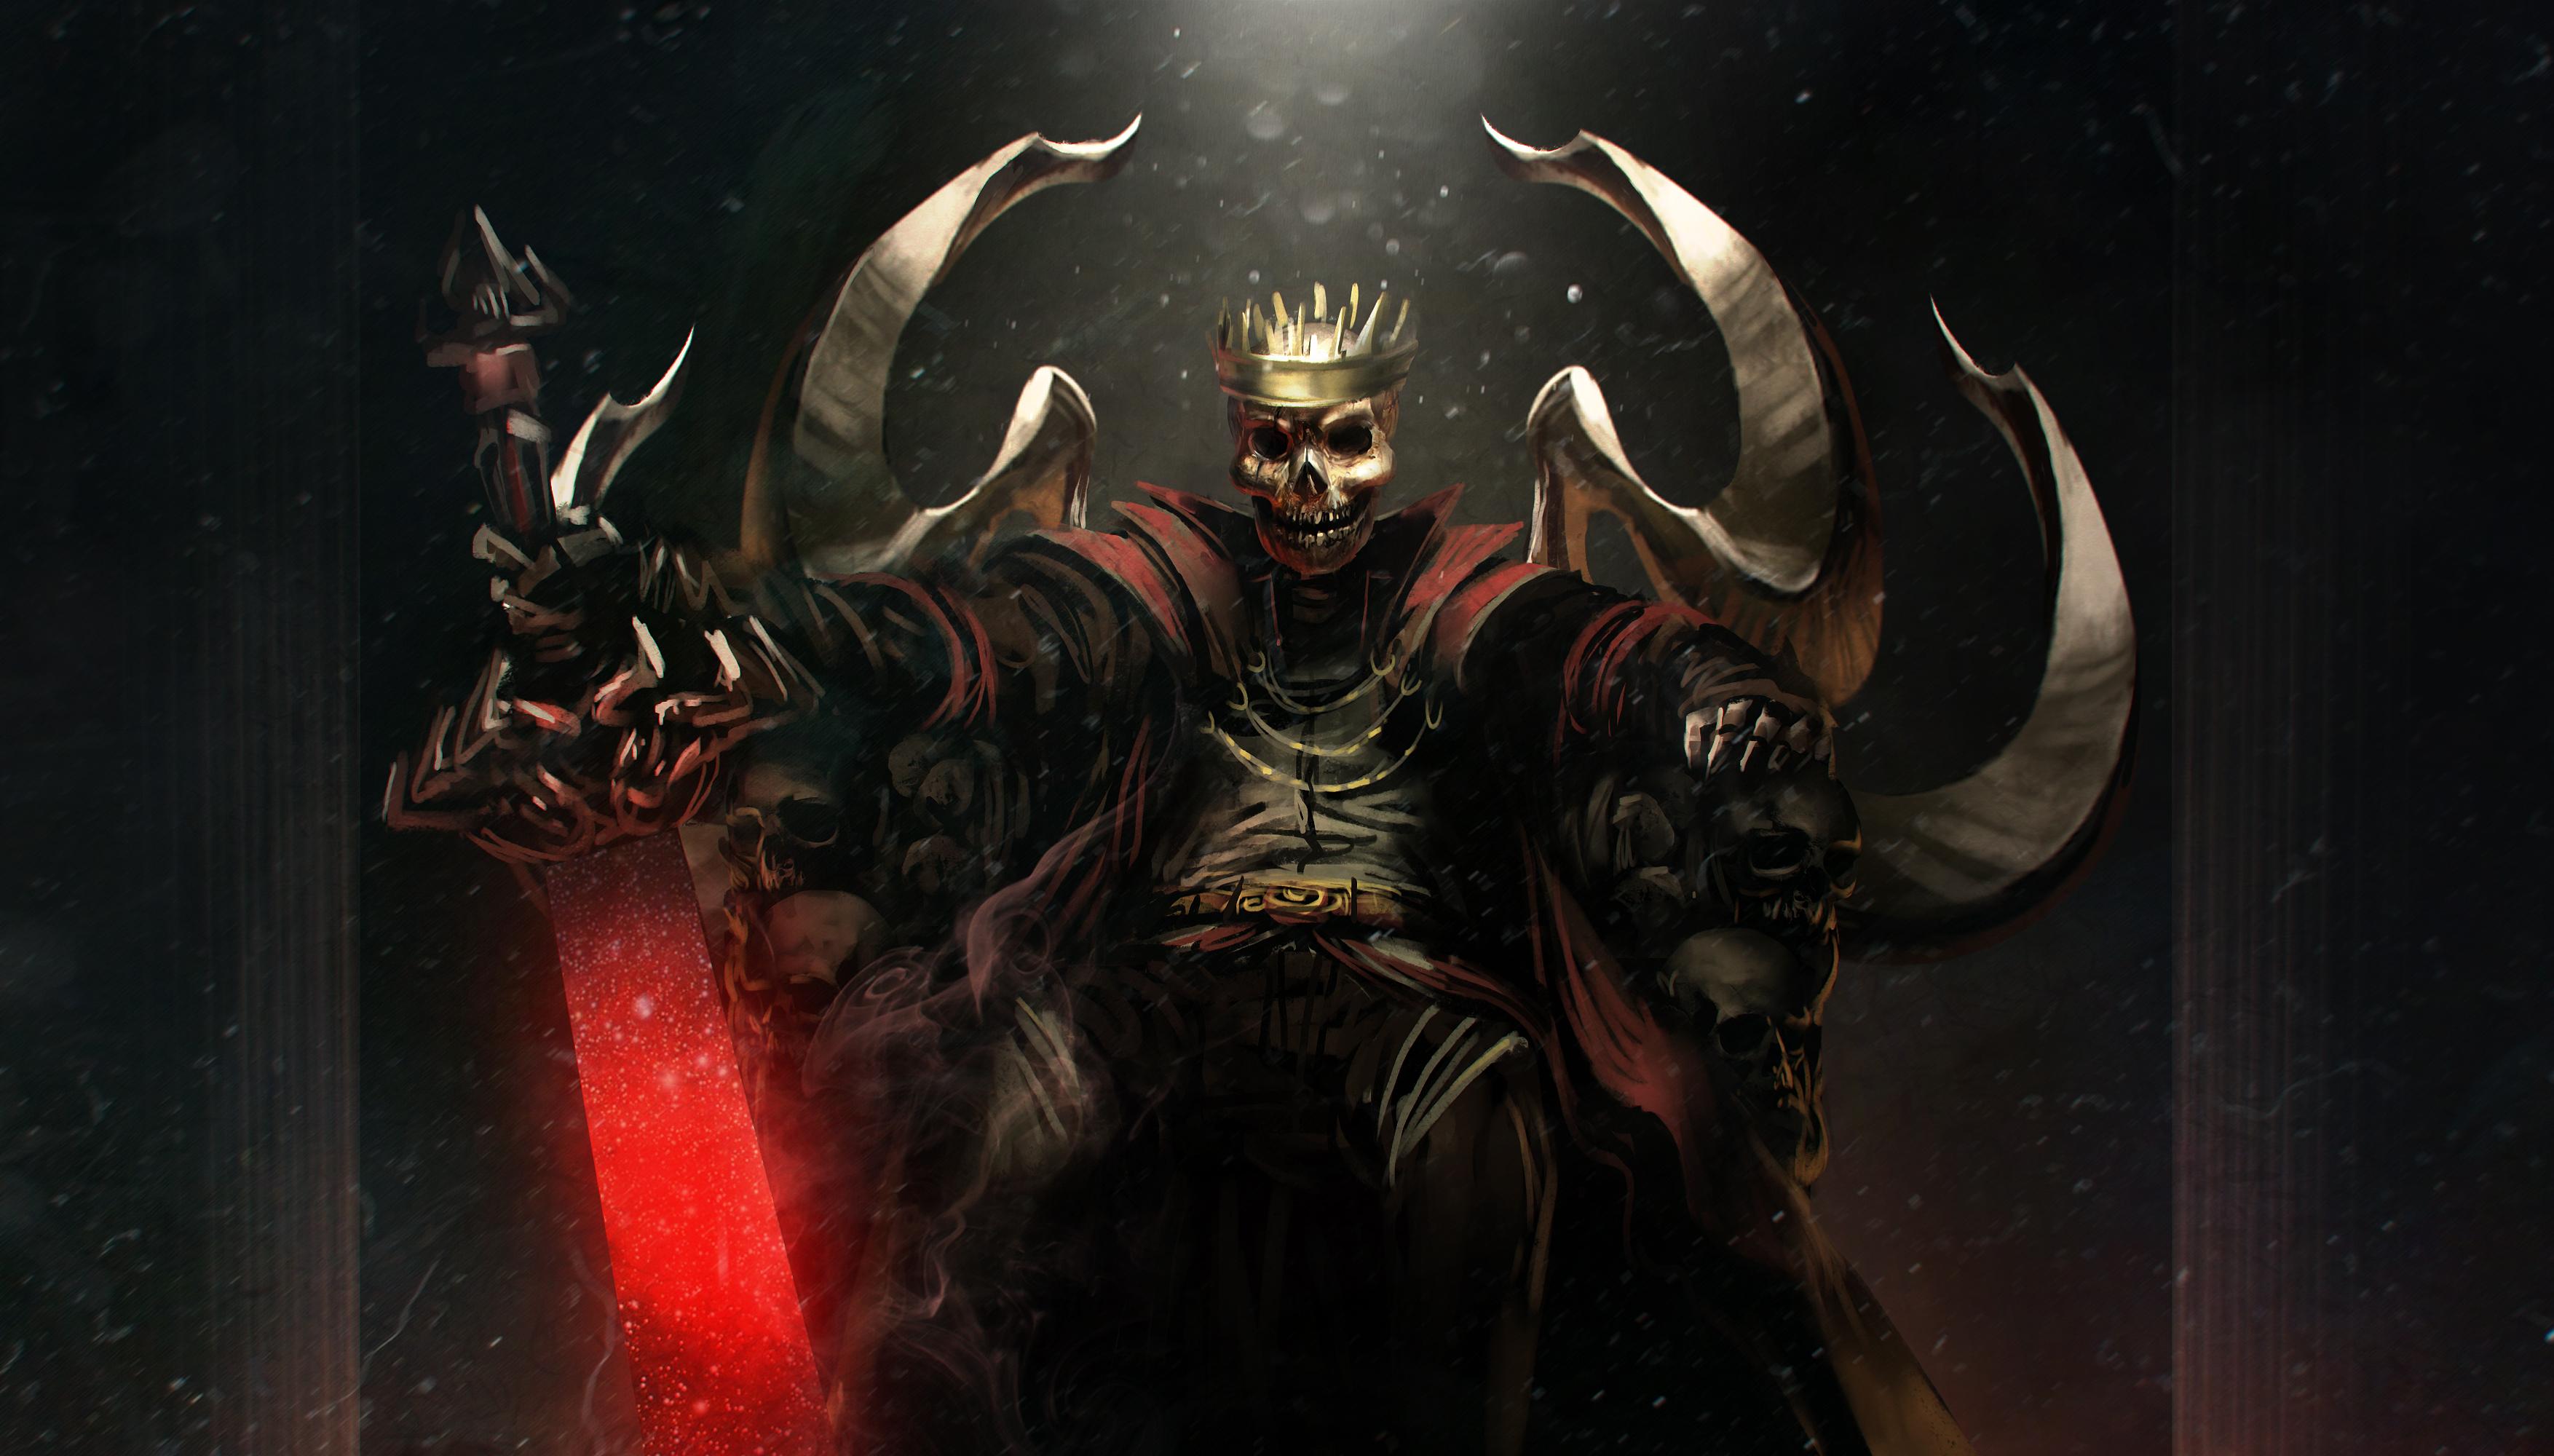 Skeleton Overlord HD Wallpaper